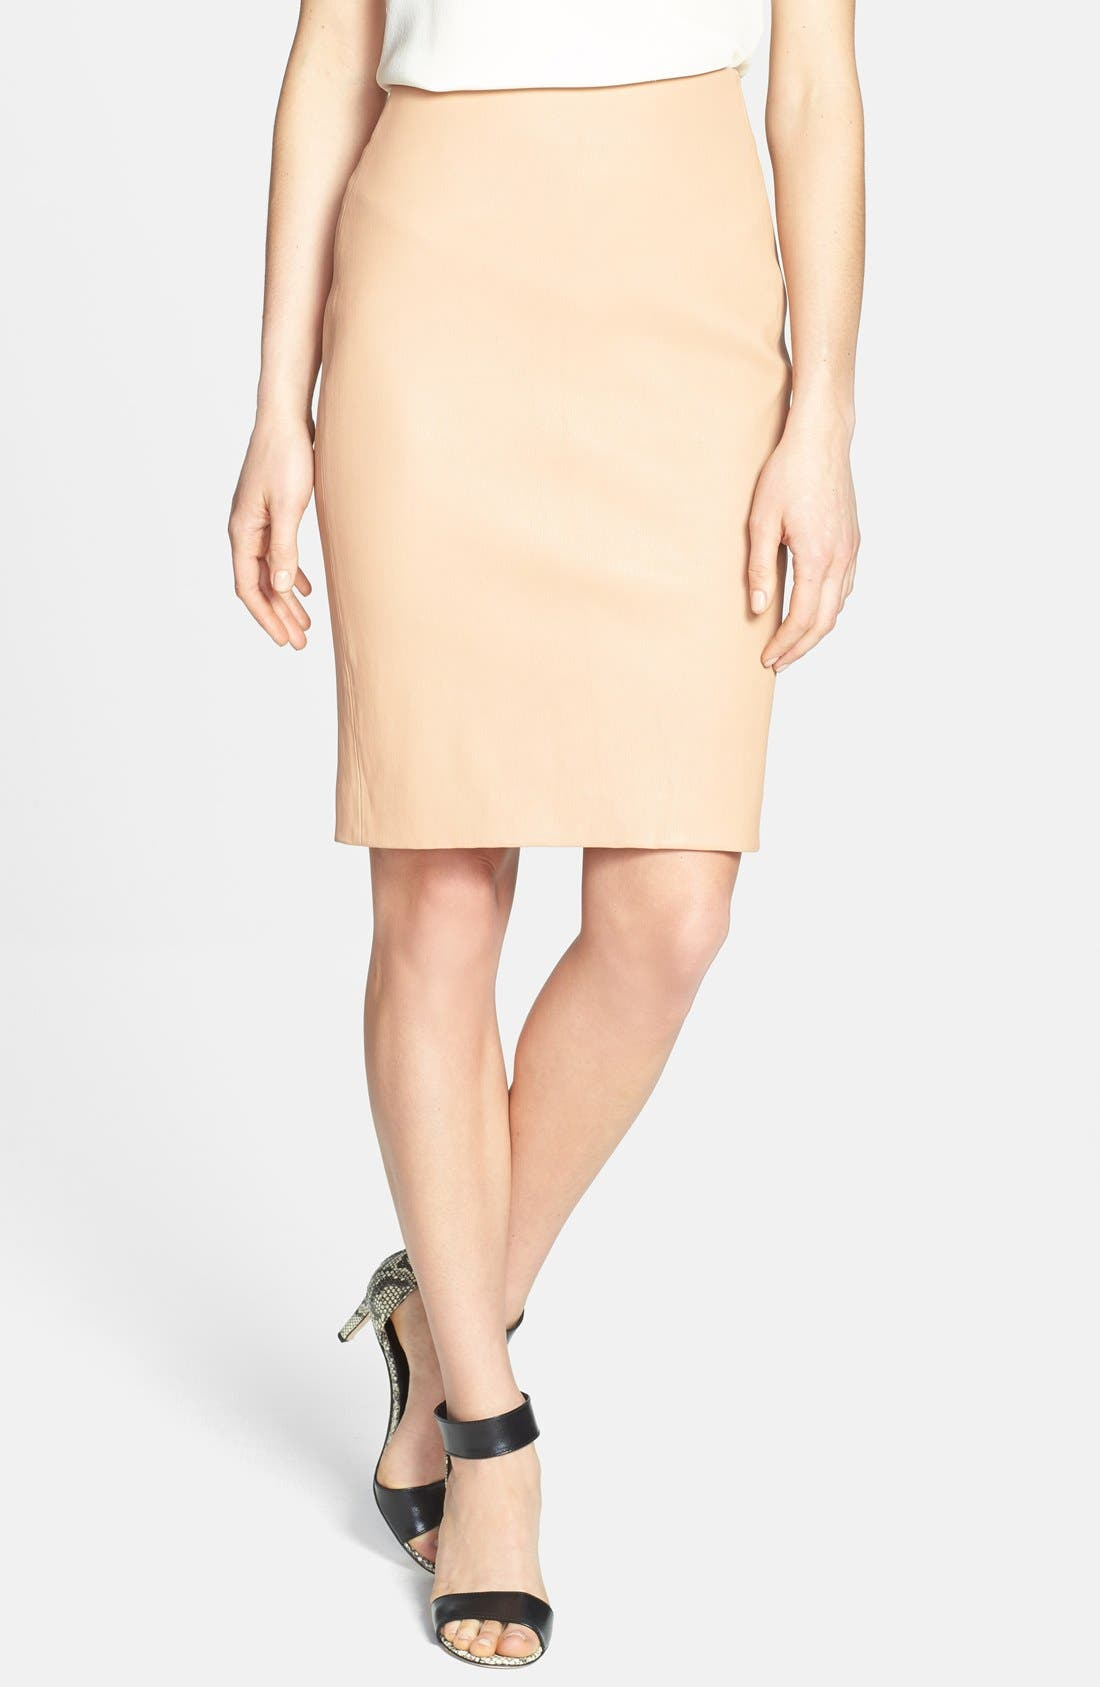 Alternate Image 1 Selected - Diane von Furstenberg 'Marta' Paneled Leather Skirt